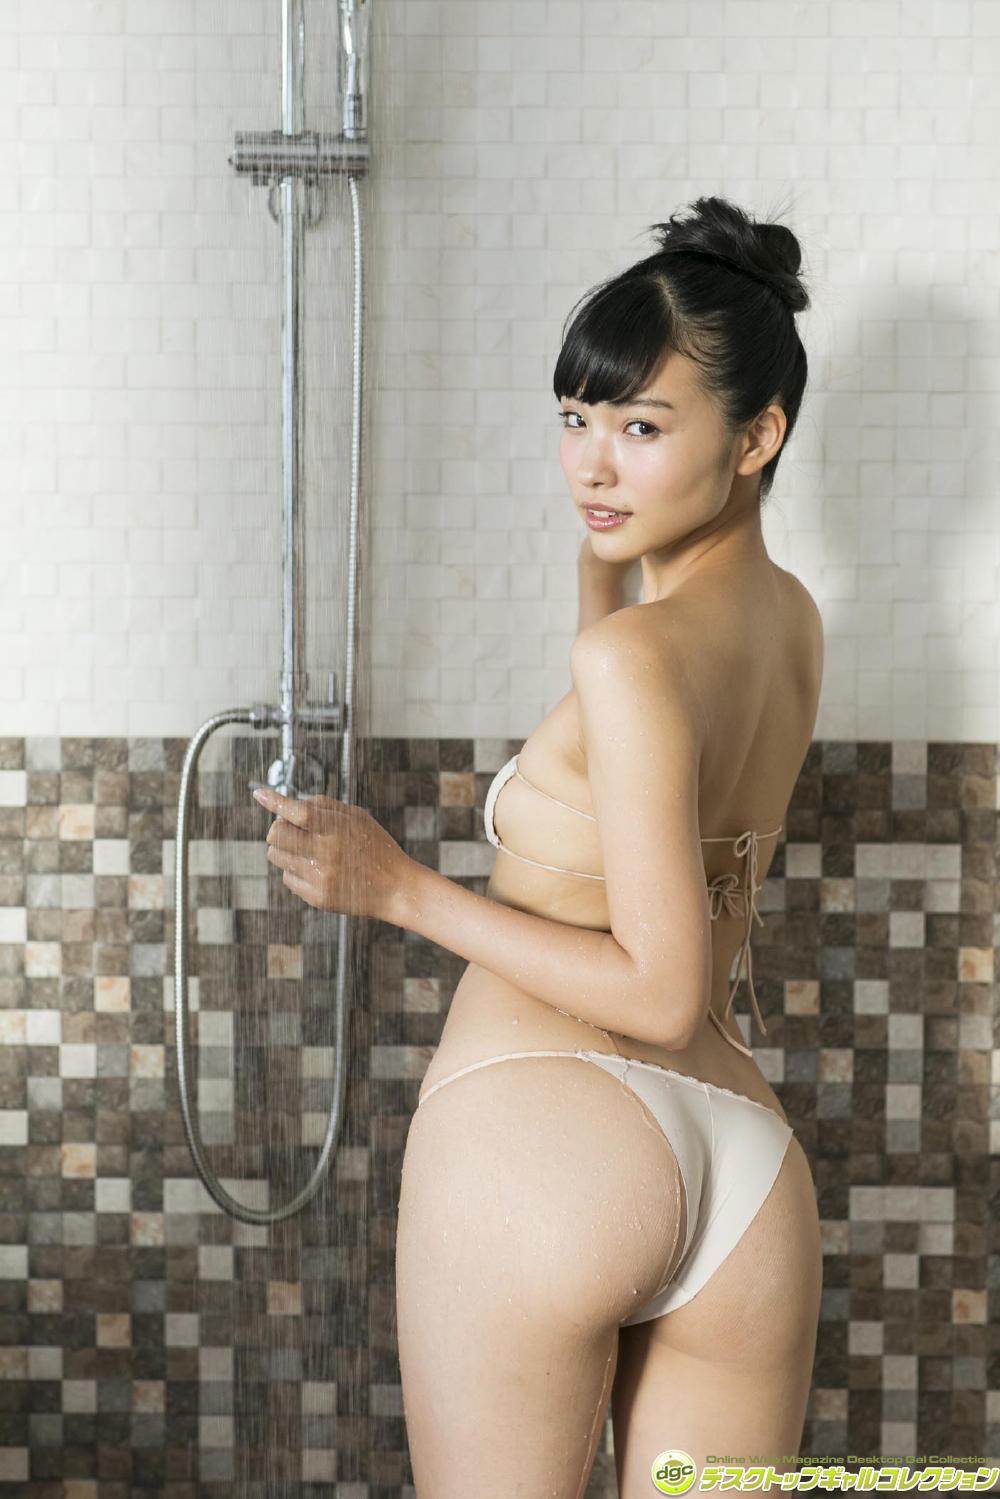 83-jpg [DGC] 2017.07 Karen Koyabayashi 小林かれん 誰もが恋するキュートな美尻をまるかじり! [100P77.7MB] dgc 07280